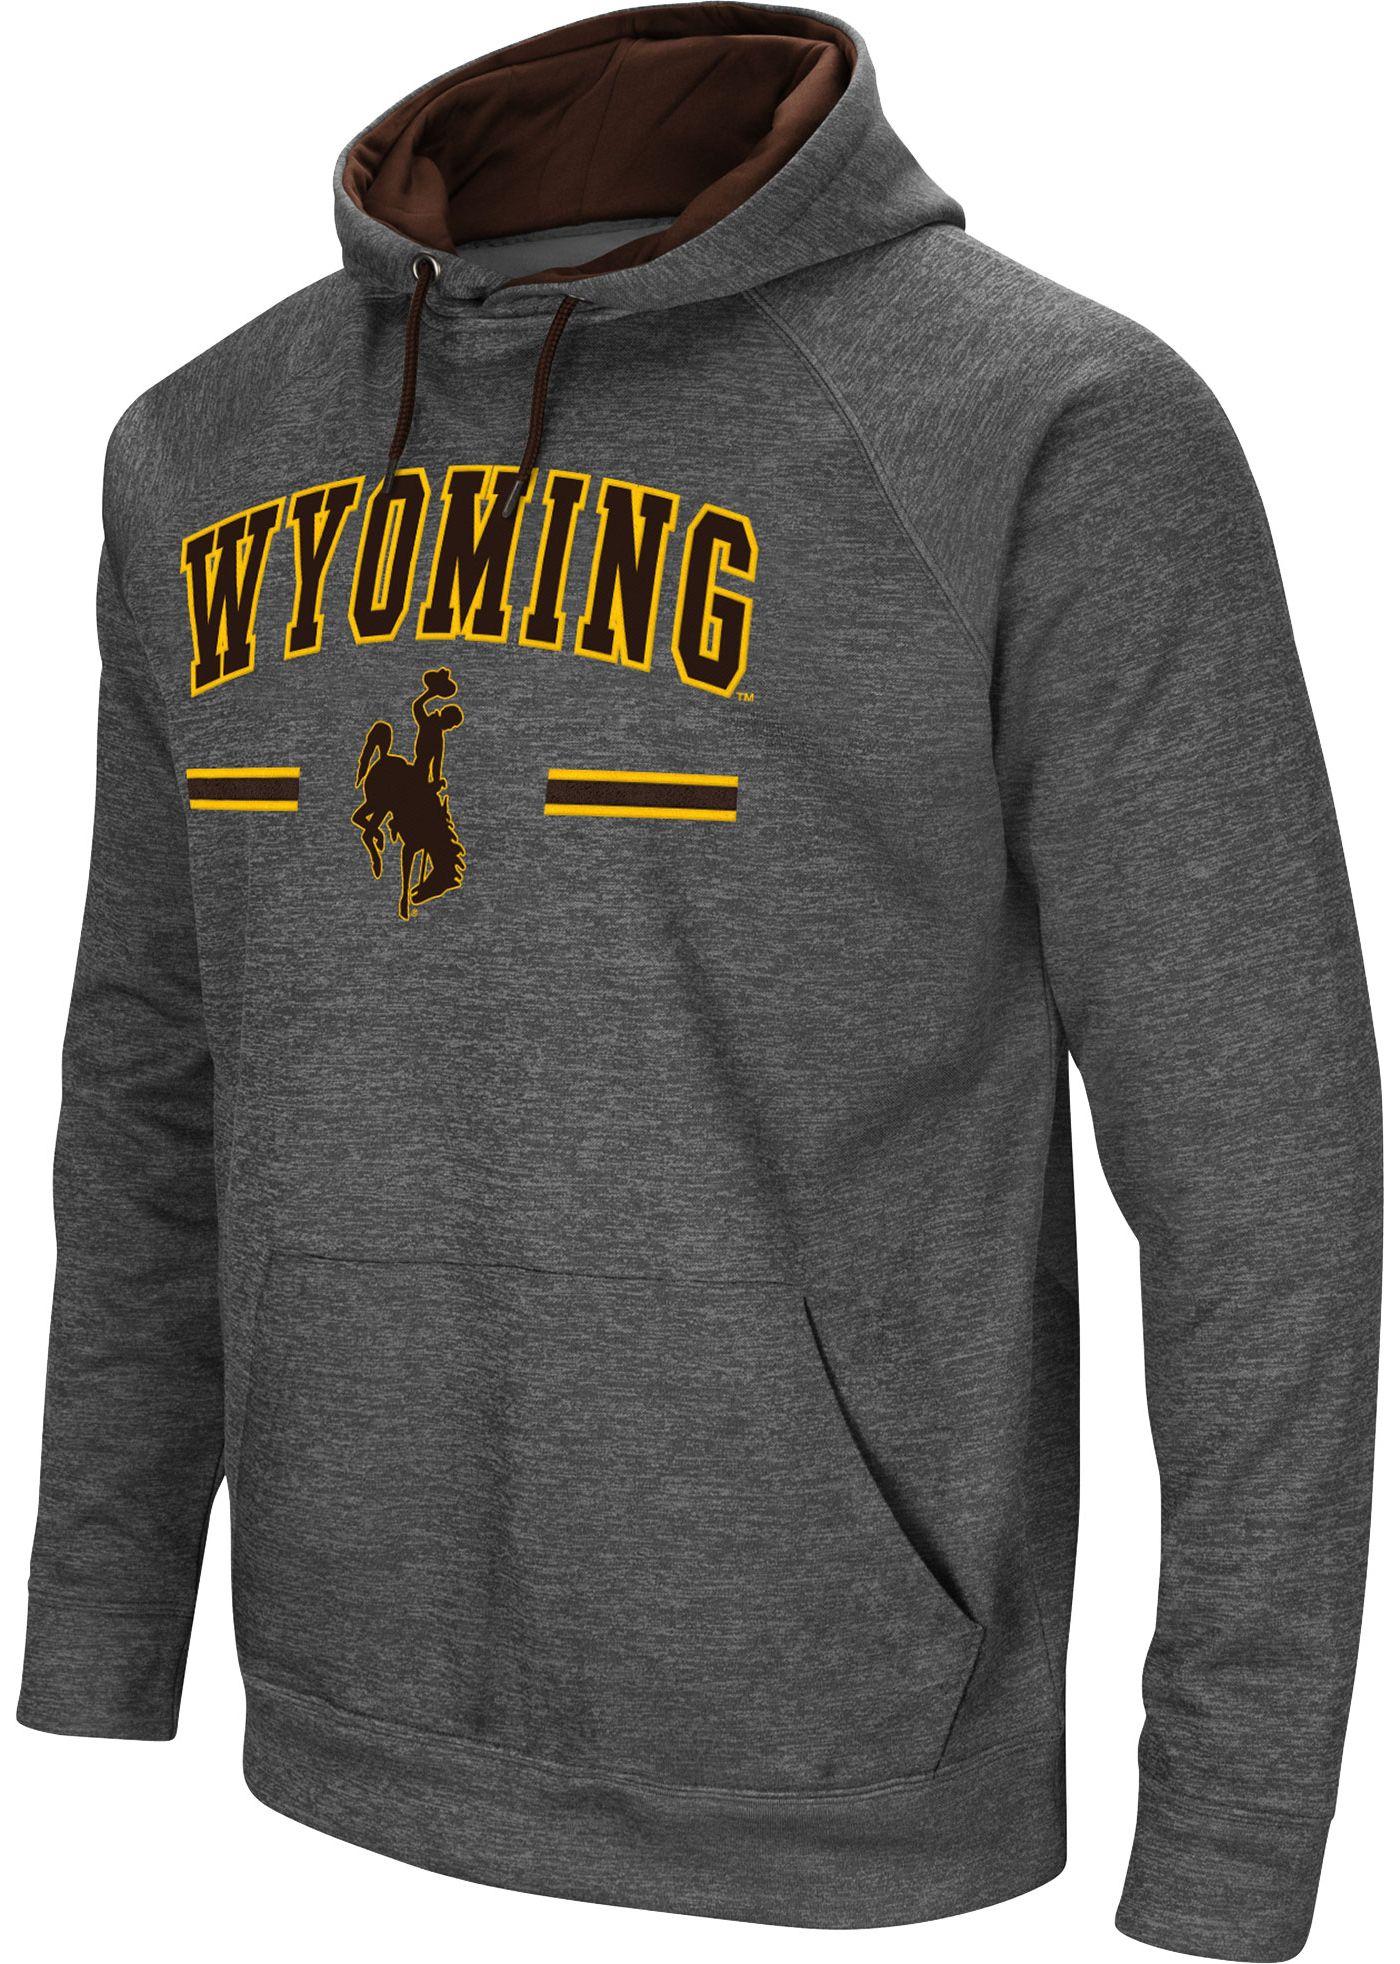 Colosseum Men's Wyoming Cowboys Grey Pullover Hoodie